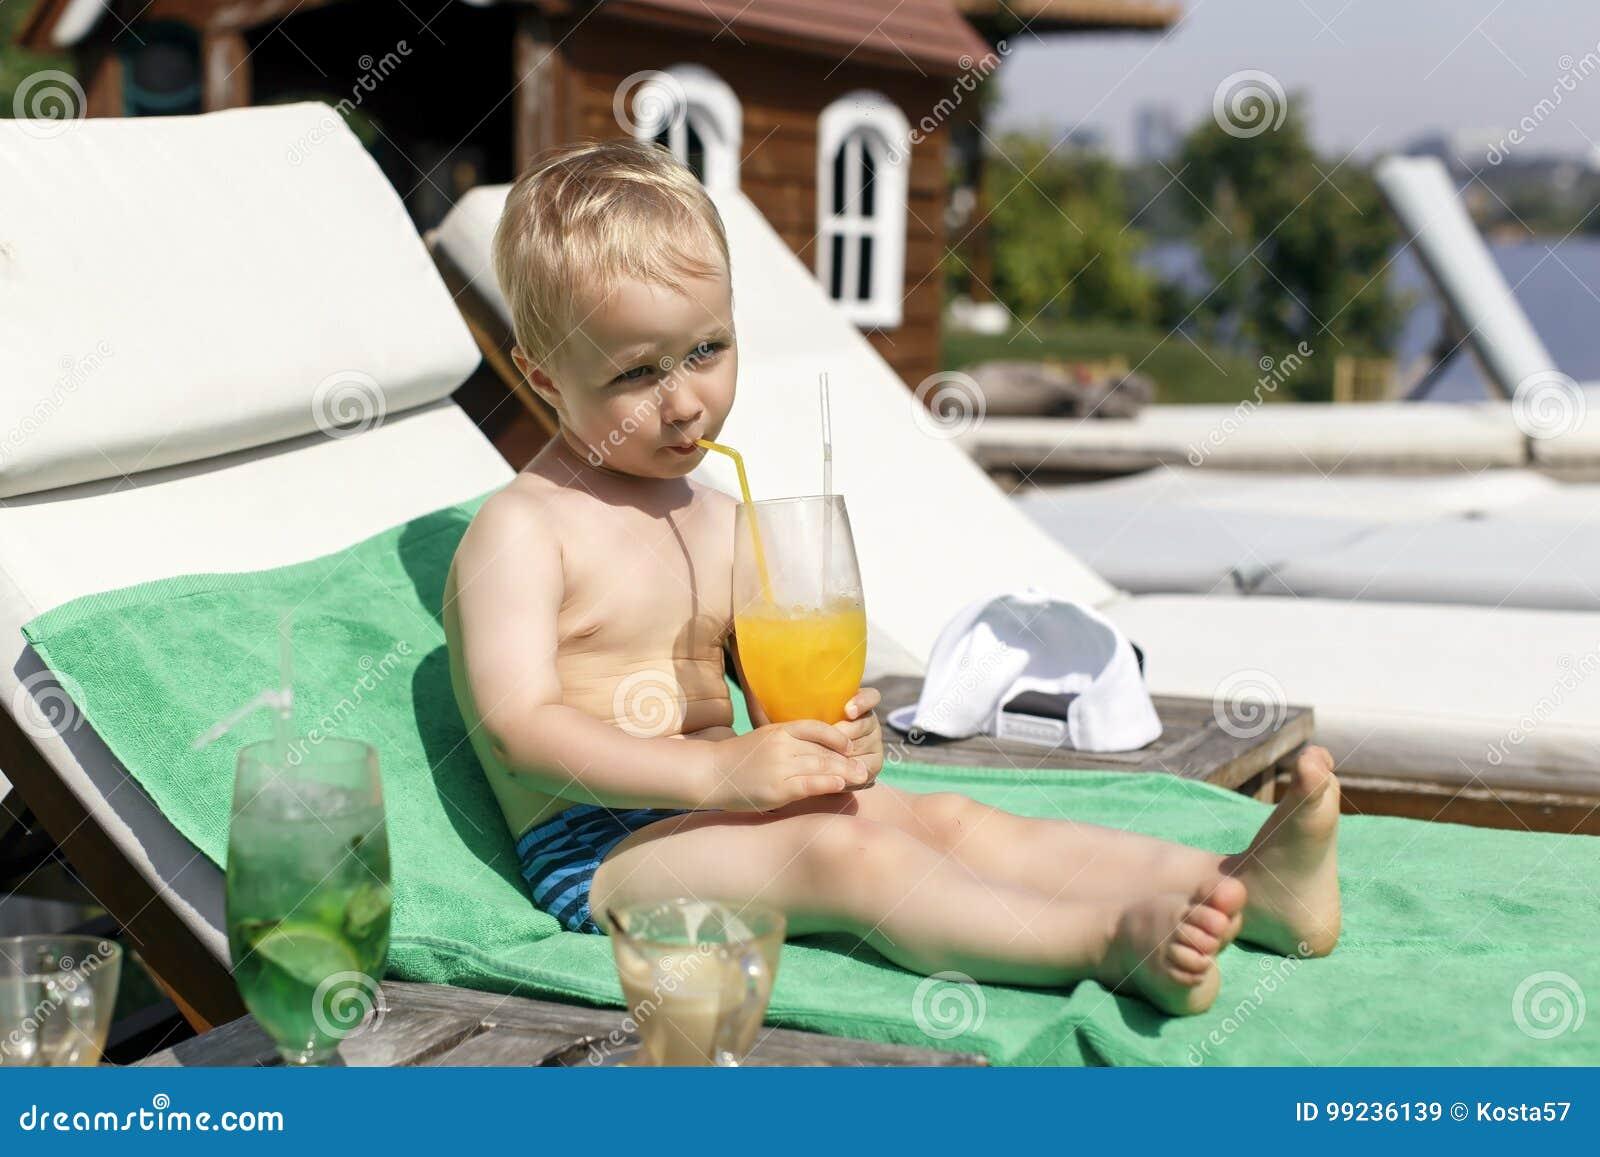 Little boy drinks a cocktail